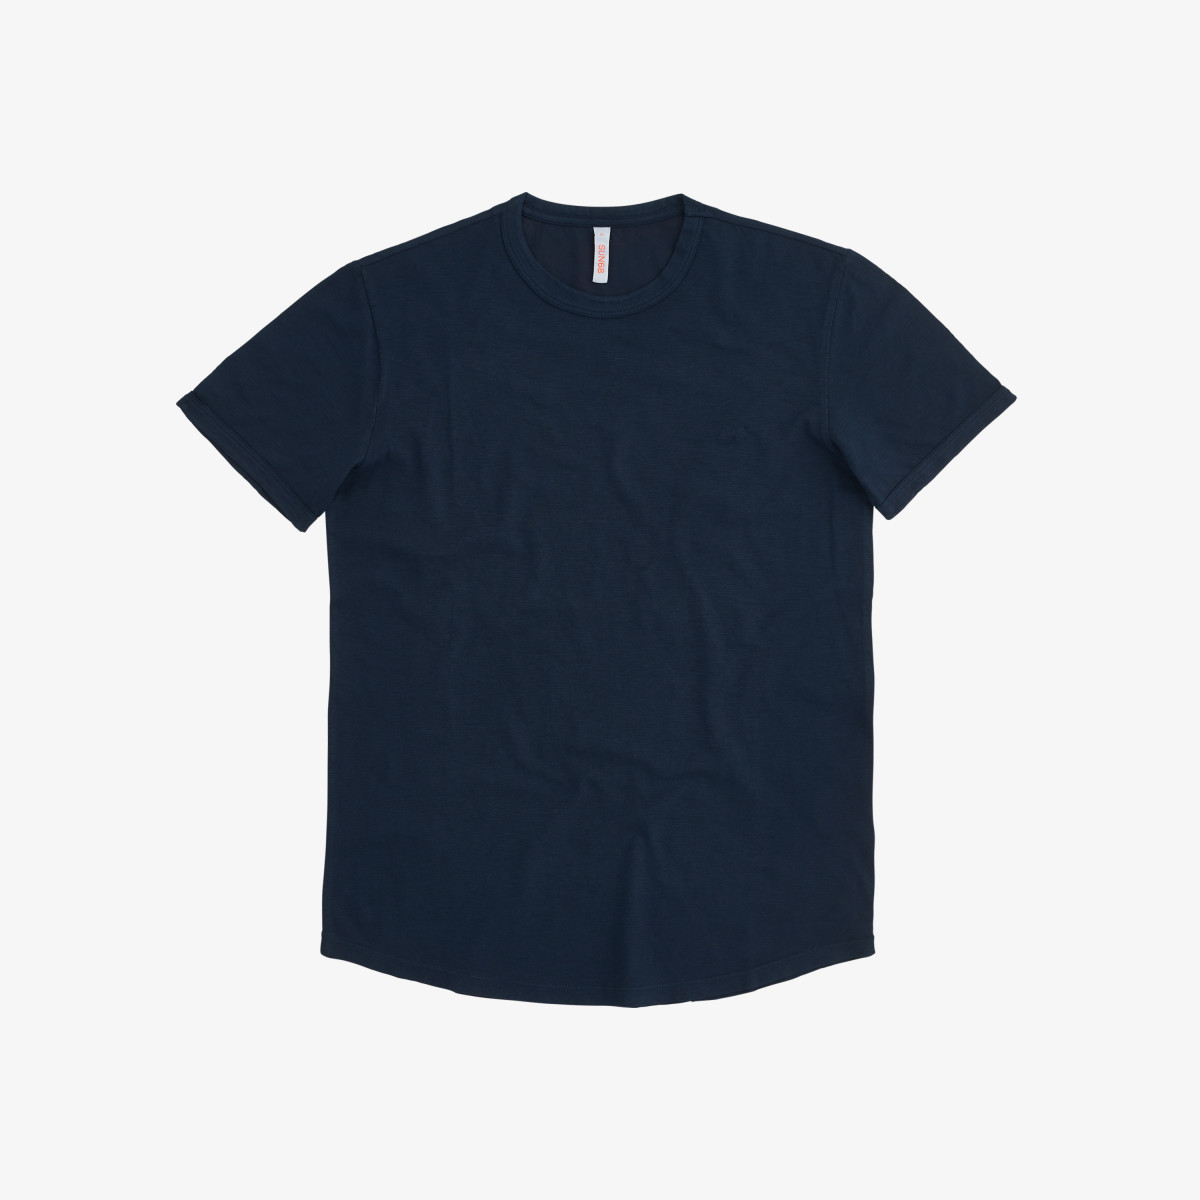 T-SHIRT ROUND BOTTOM NAVY BLUE